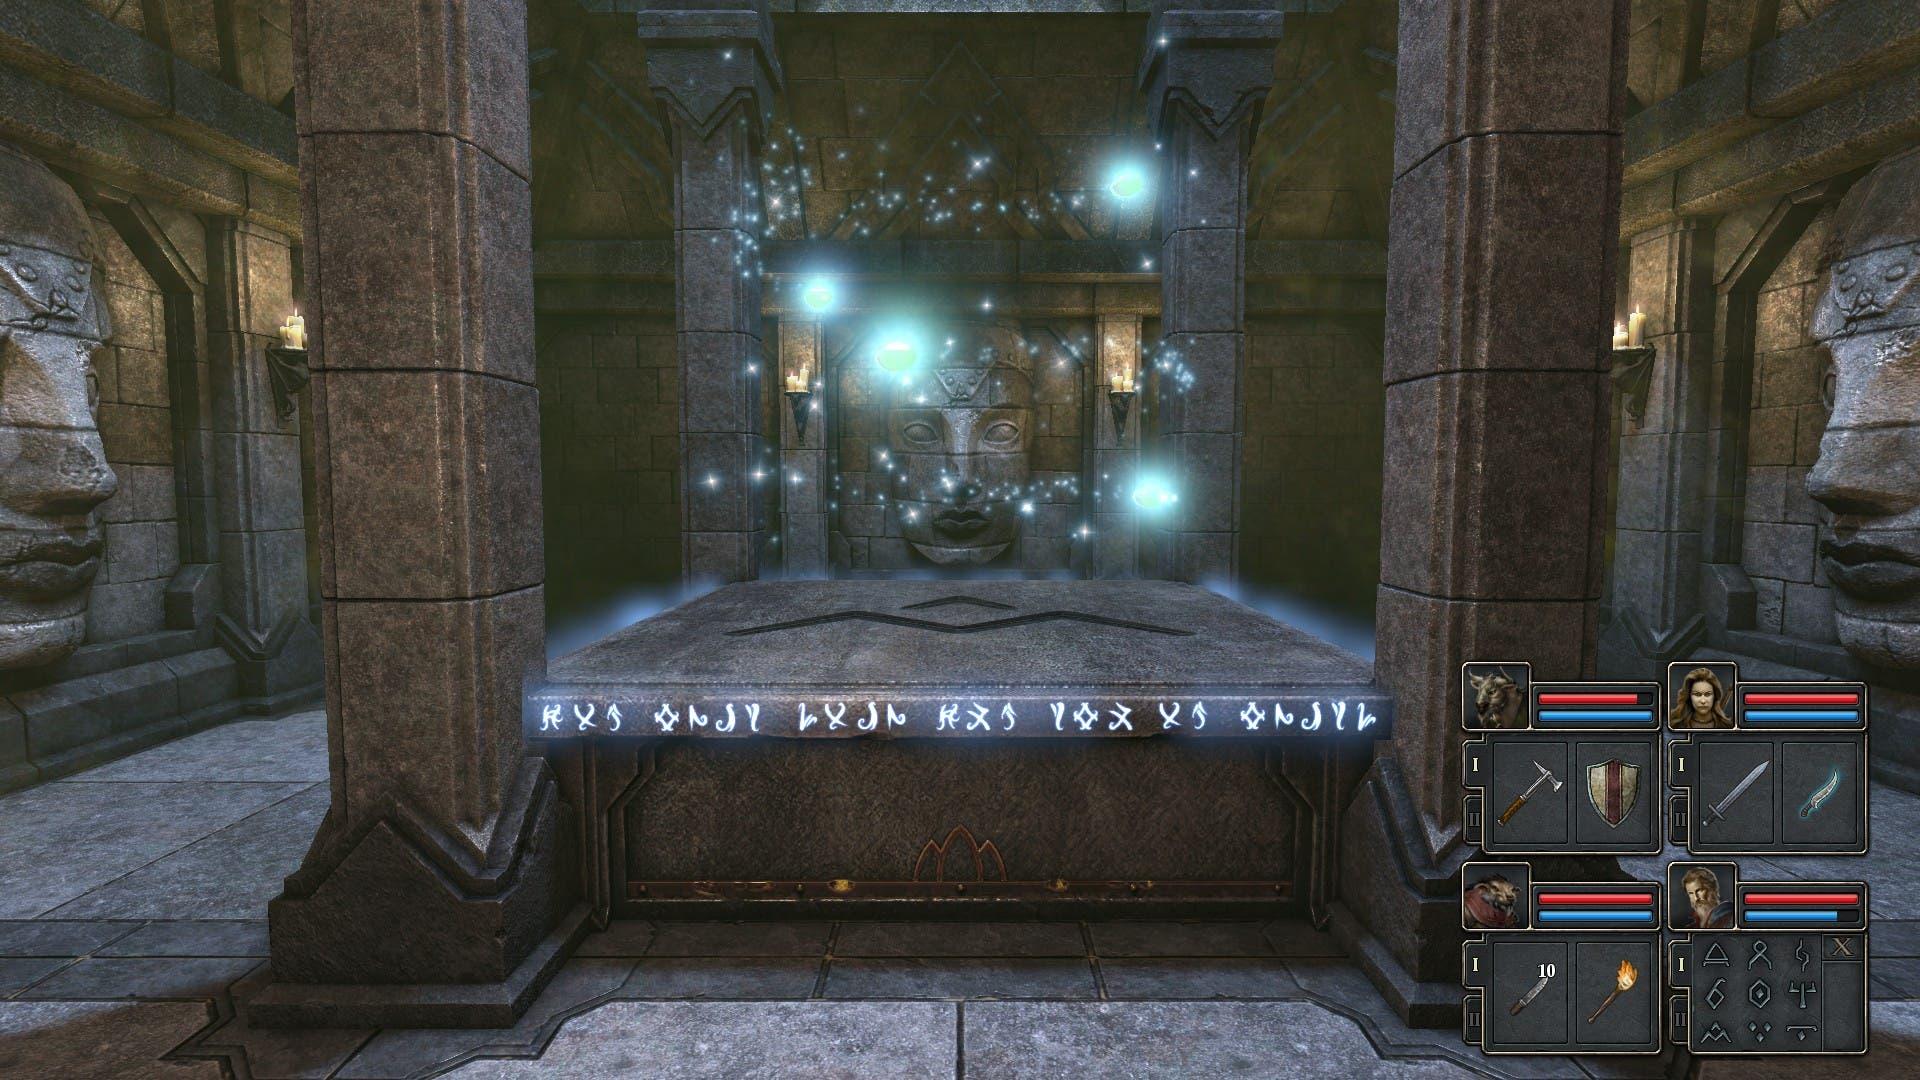 LegendOfGrimrock2_review (7)